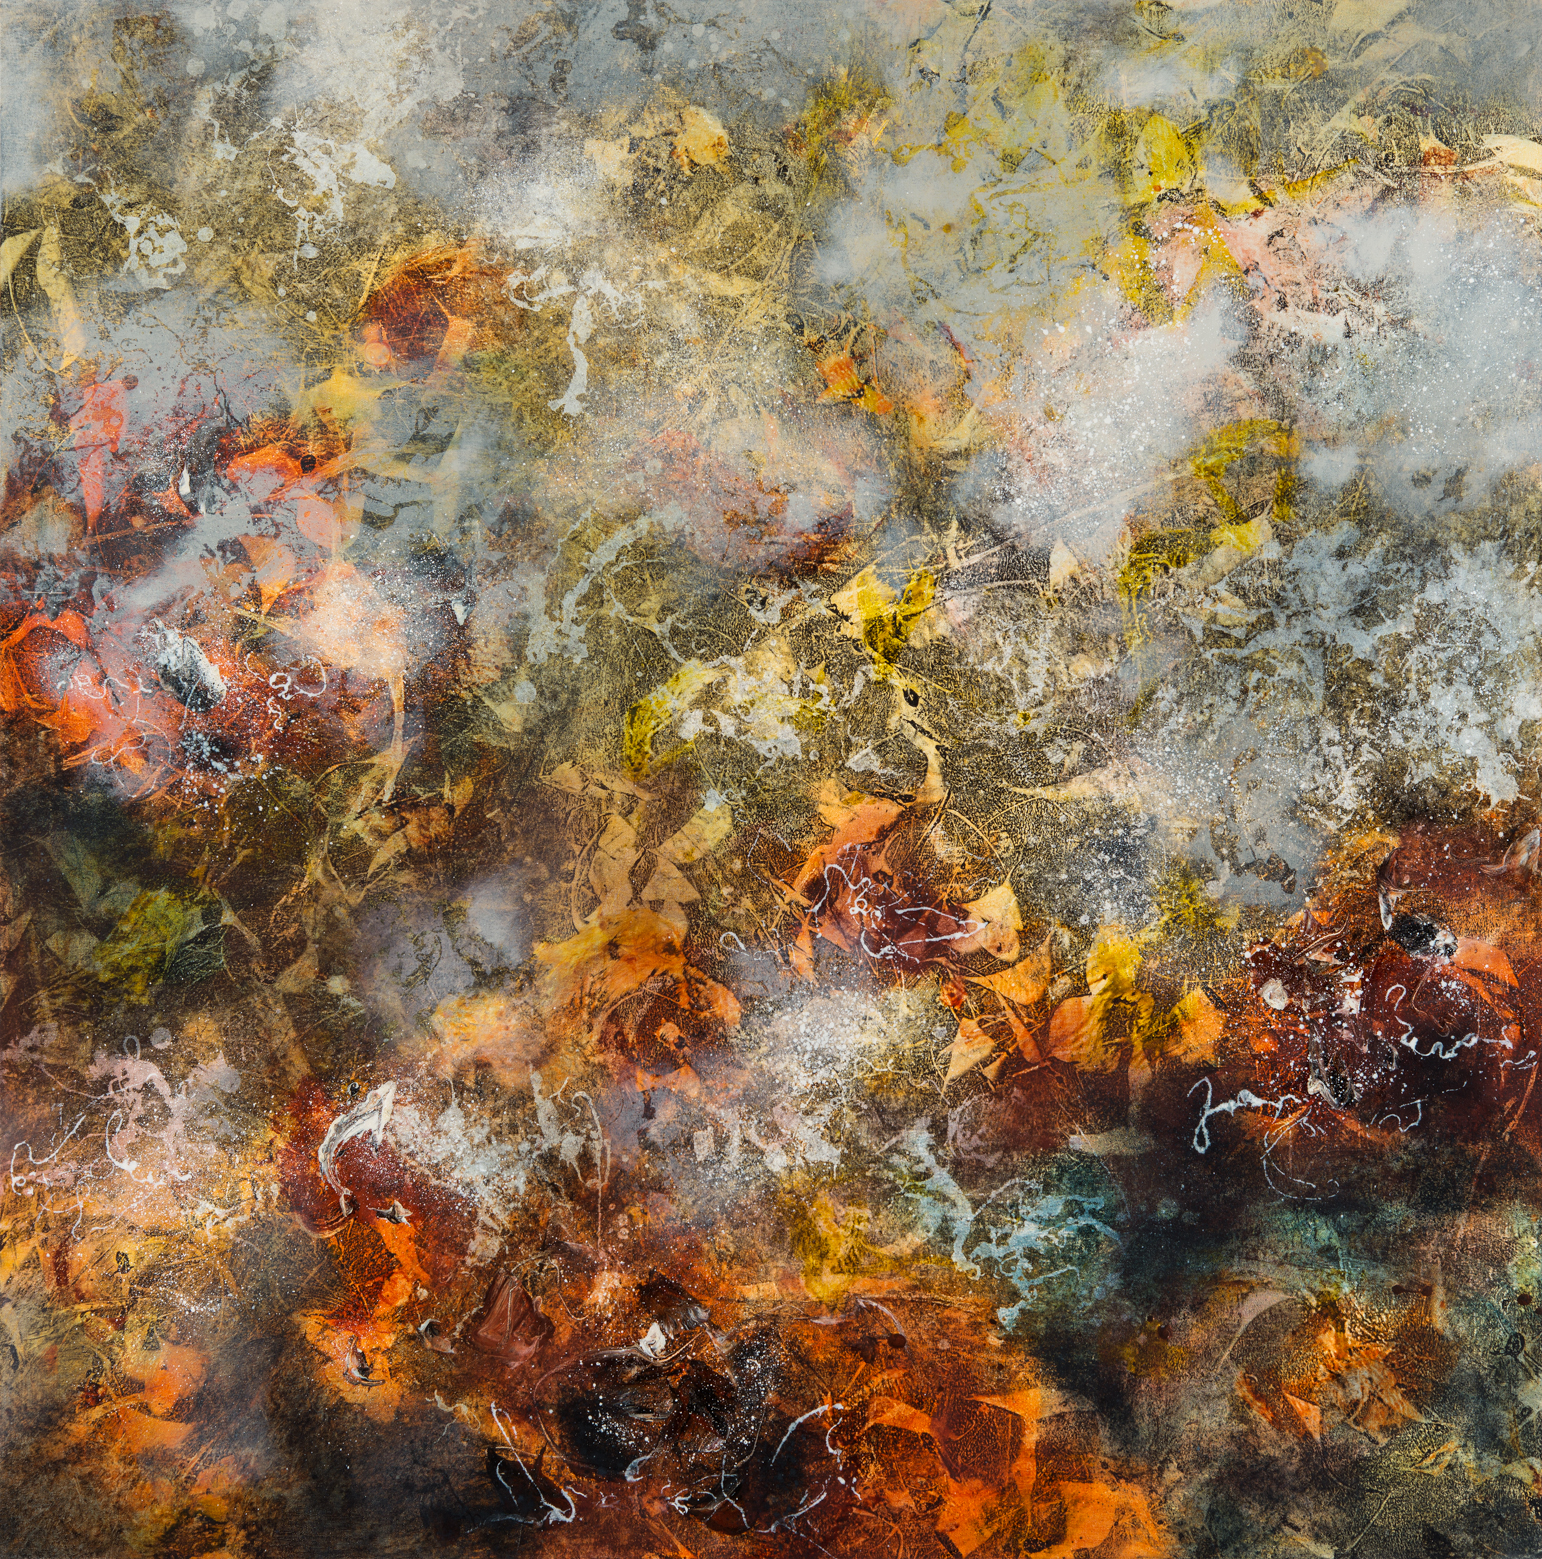 Origin, oil on canvas, 125 x 125 cm, SOLD